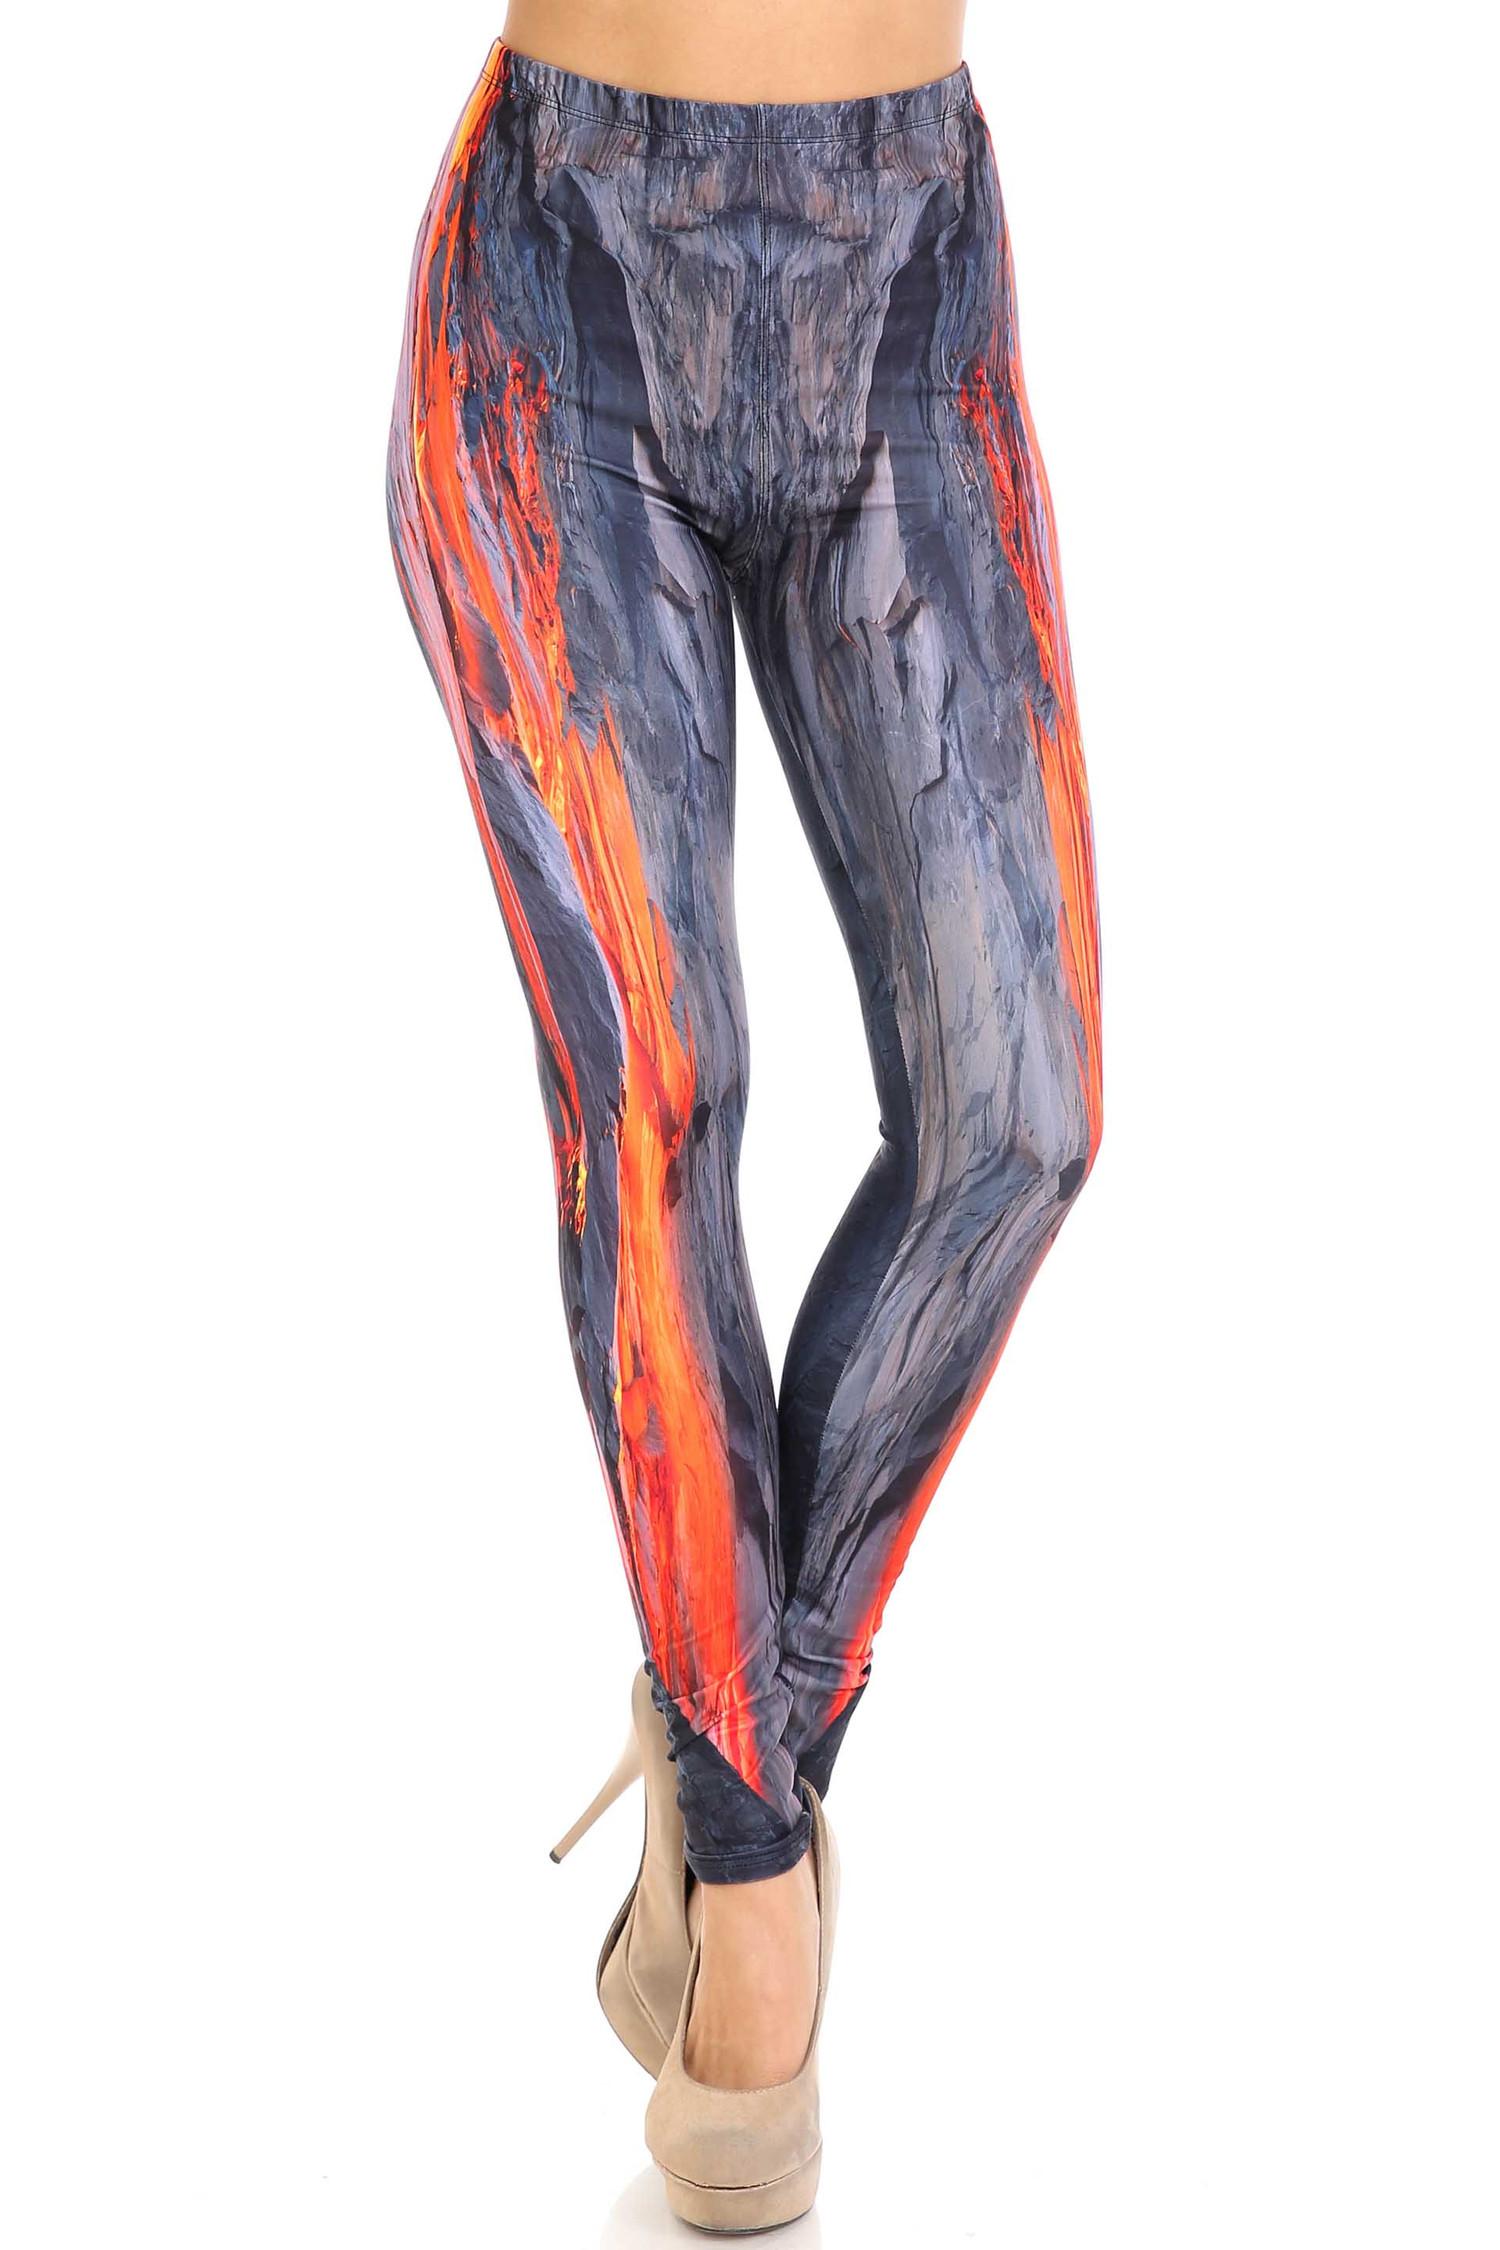 Creamy Soft Hot Lava Plus Size Leggings - By USA Fashion™